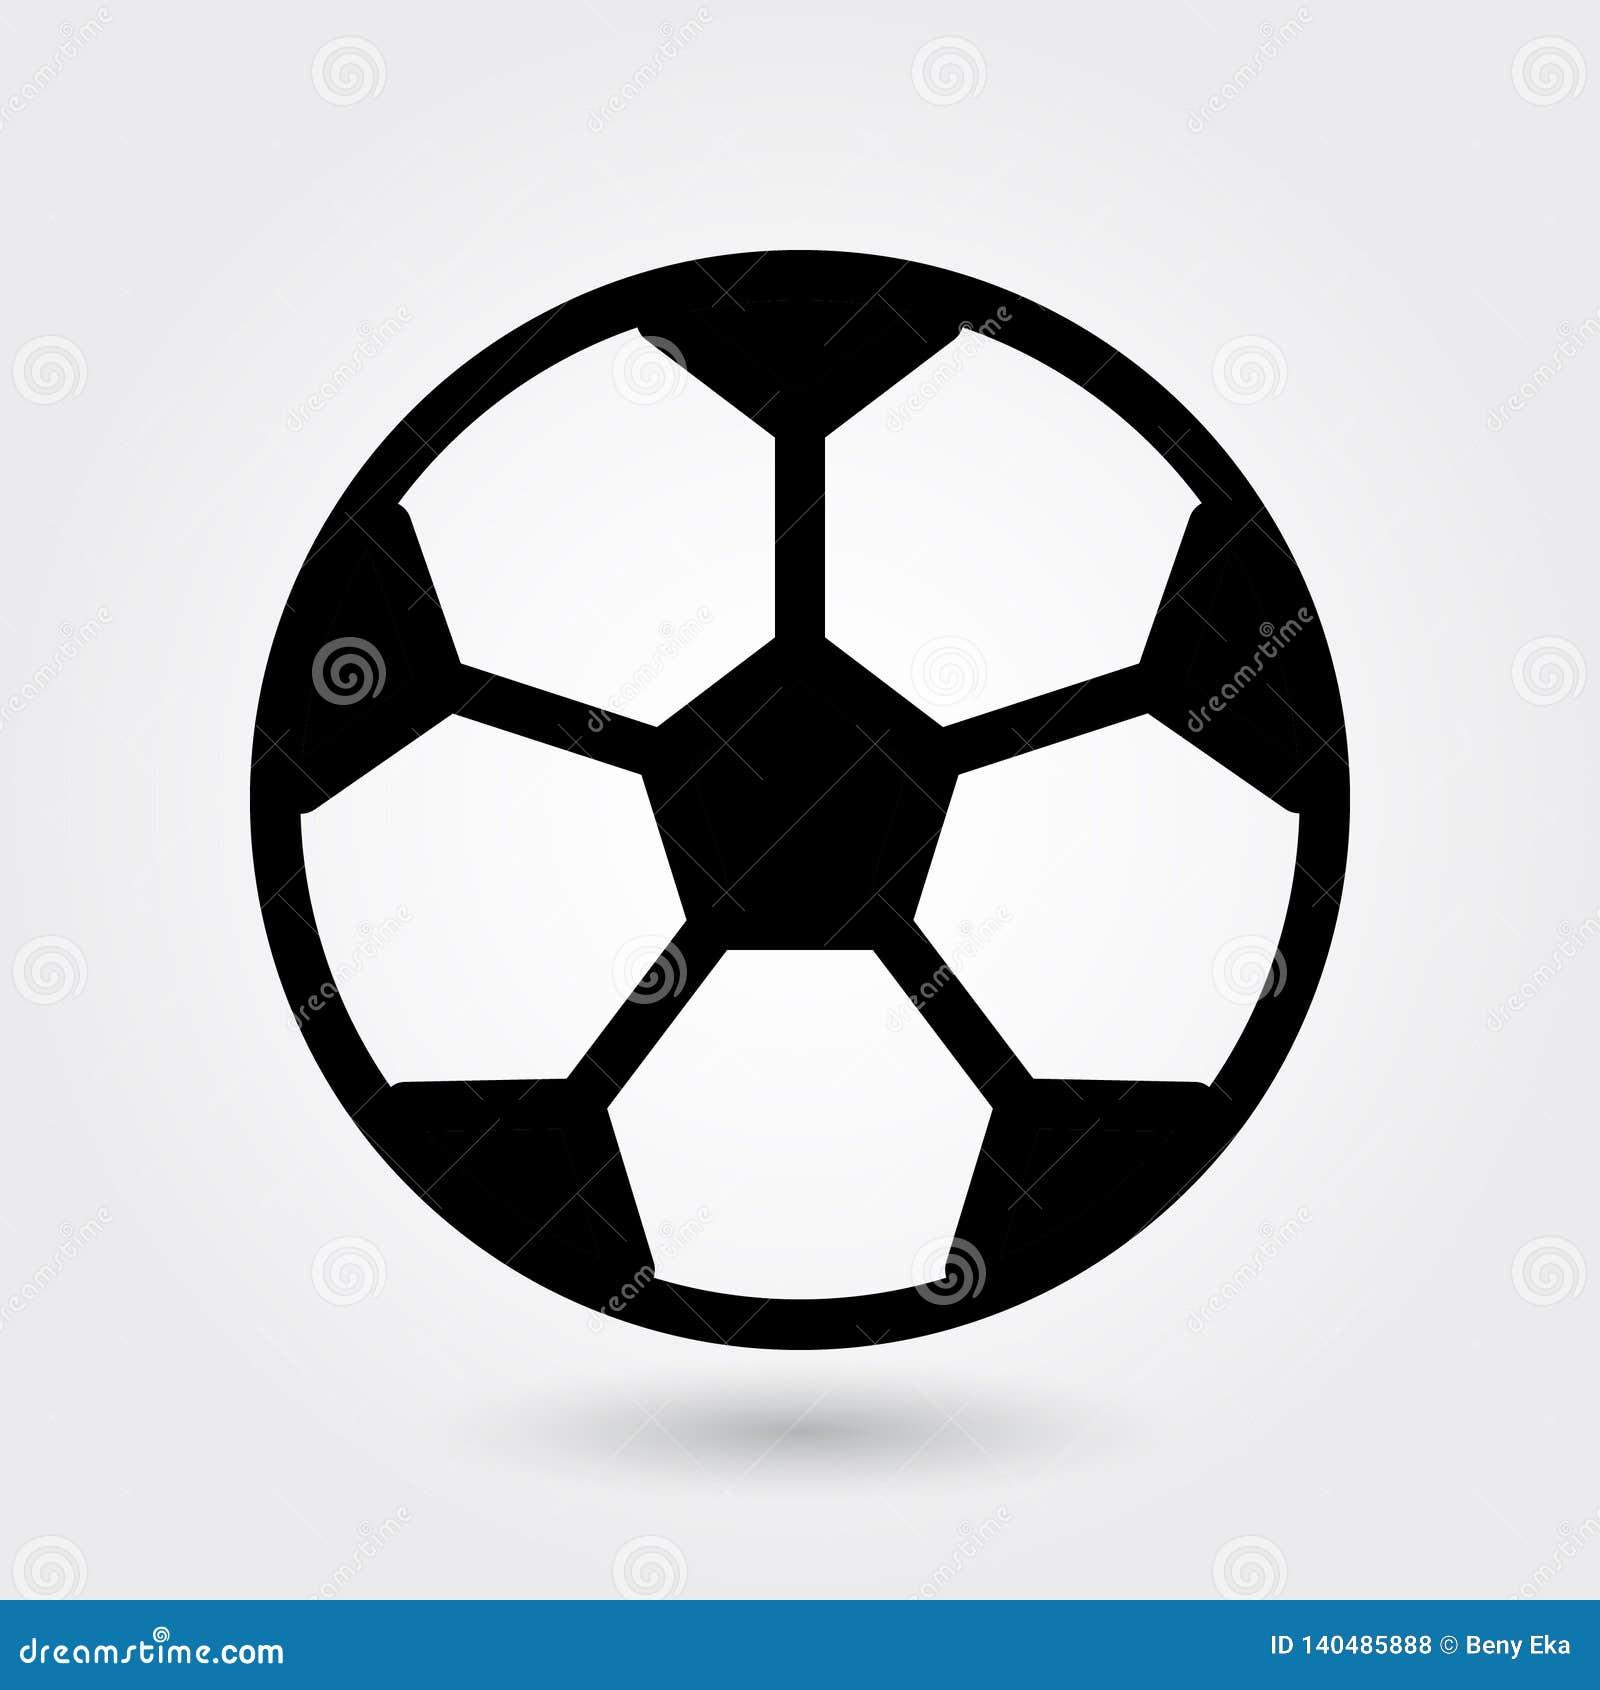 Fußballvektorikone, Fußballikone, Sportballsymbol Moderner, einfacher Glyph, feste Vektorillustration